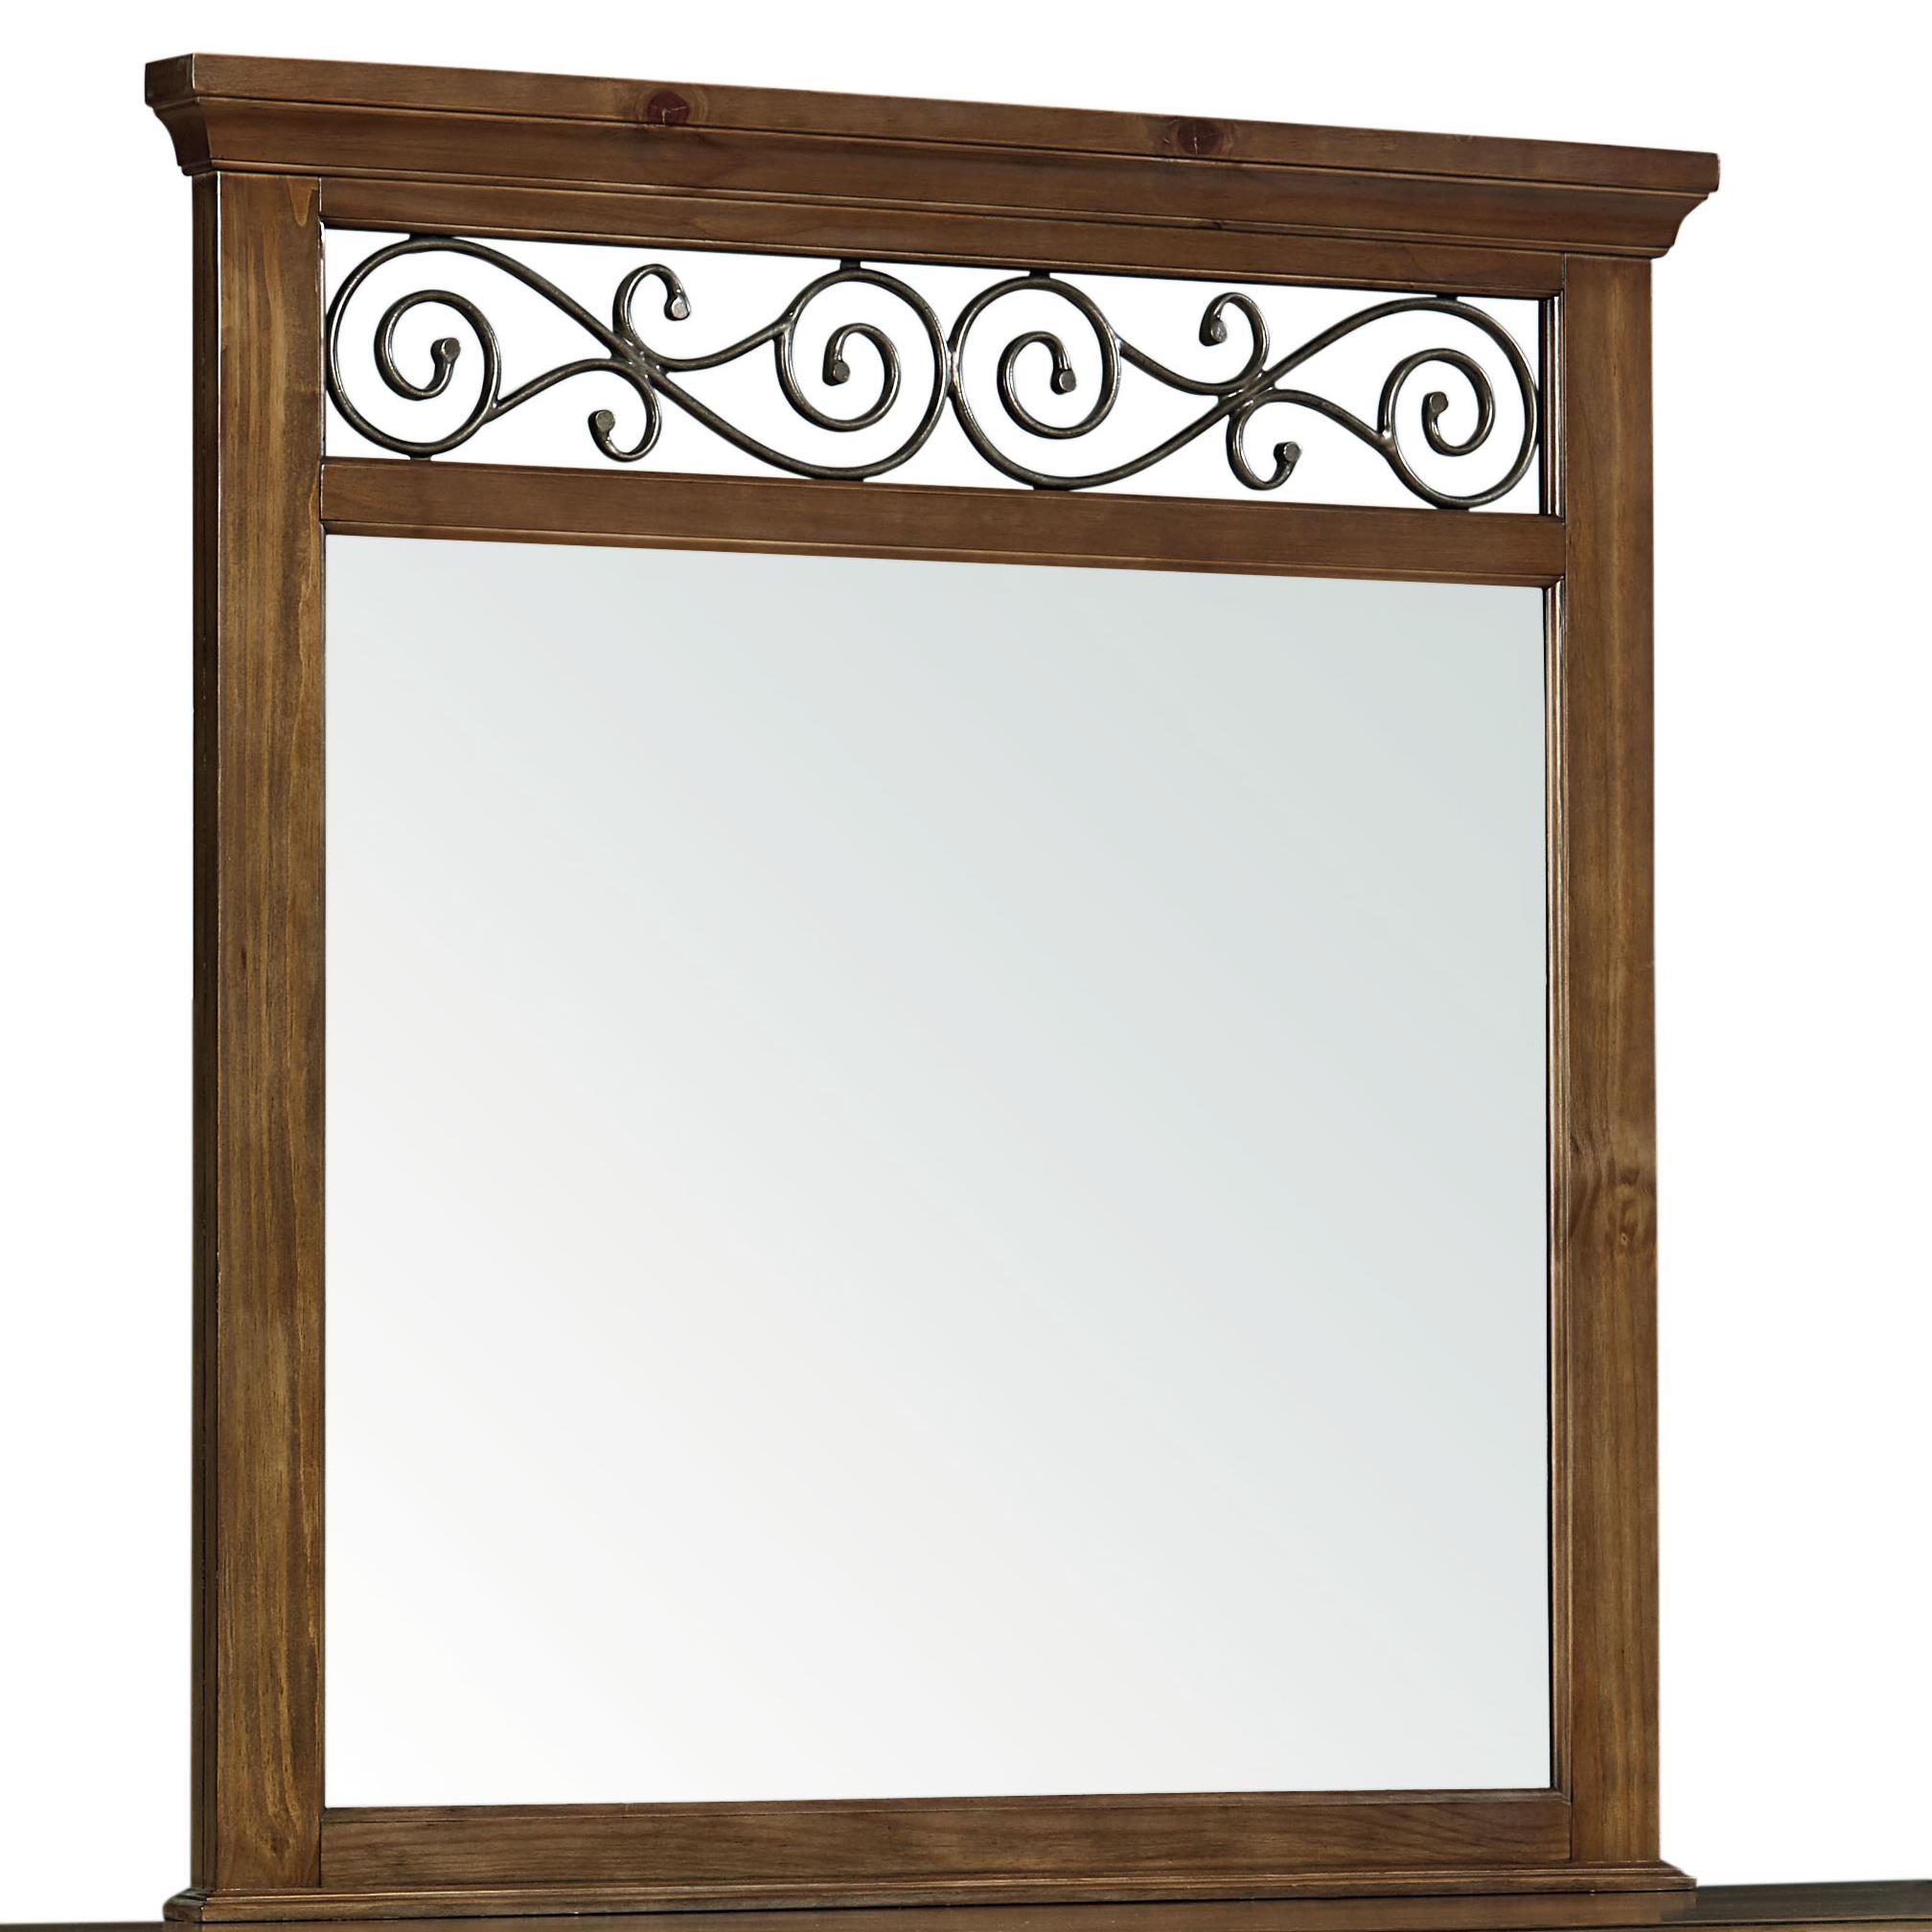 Standard Furniture Monterey  Mirror - Item Number: 81908